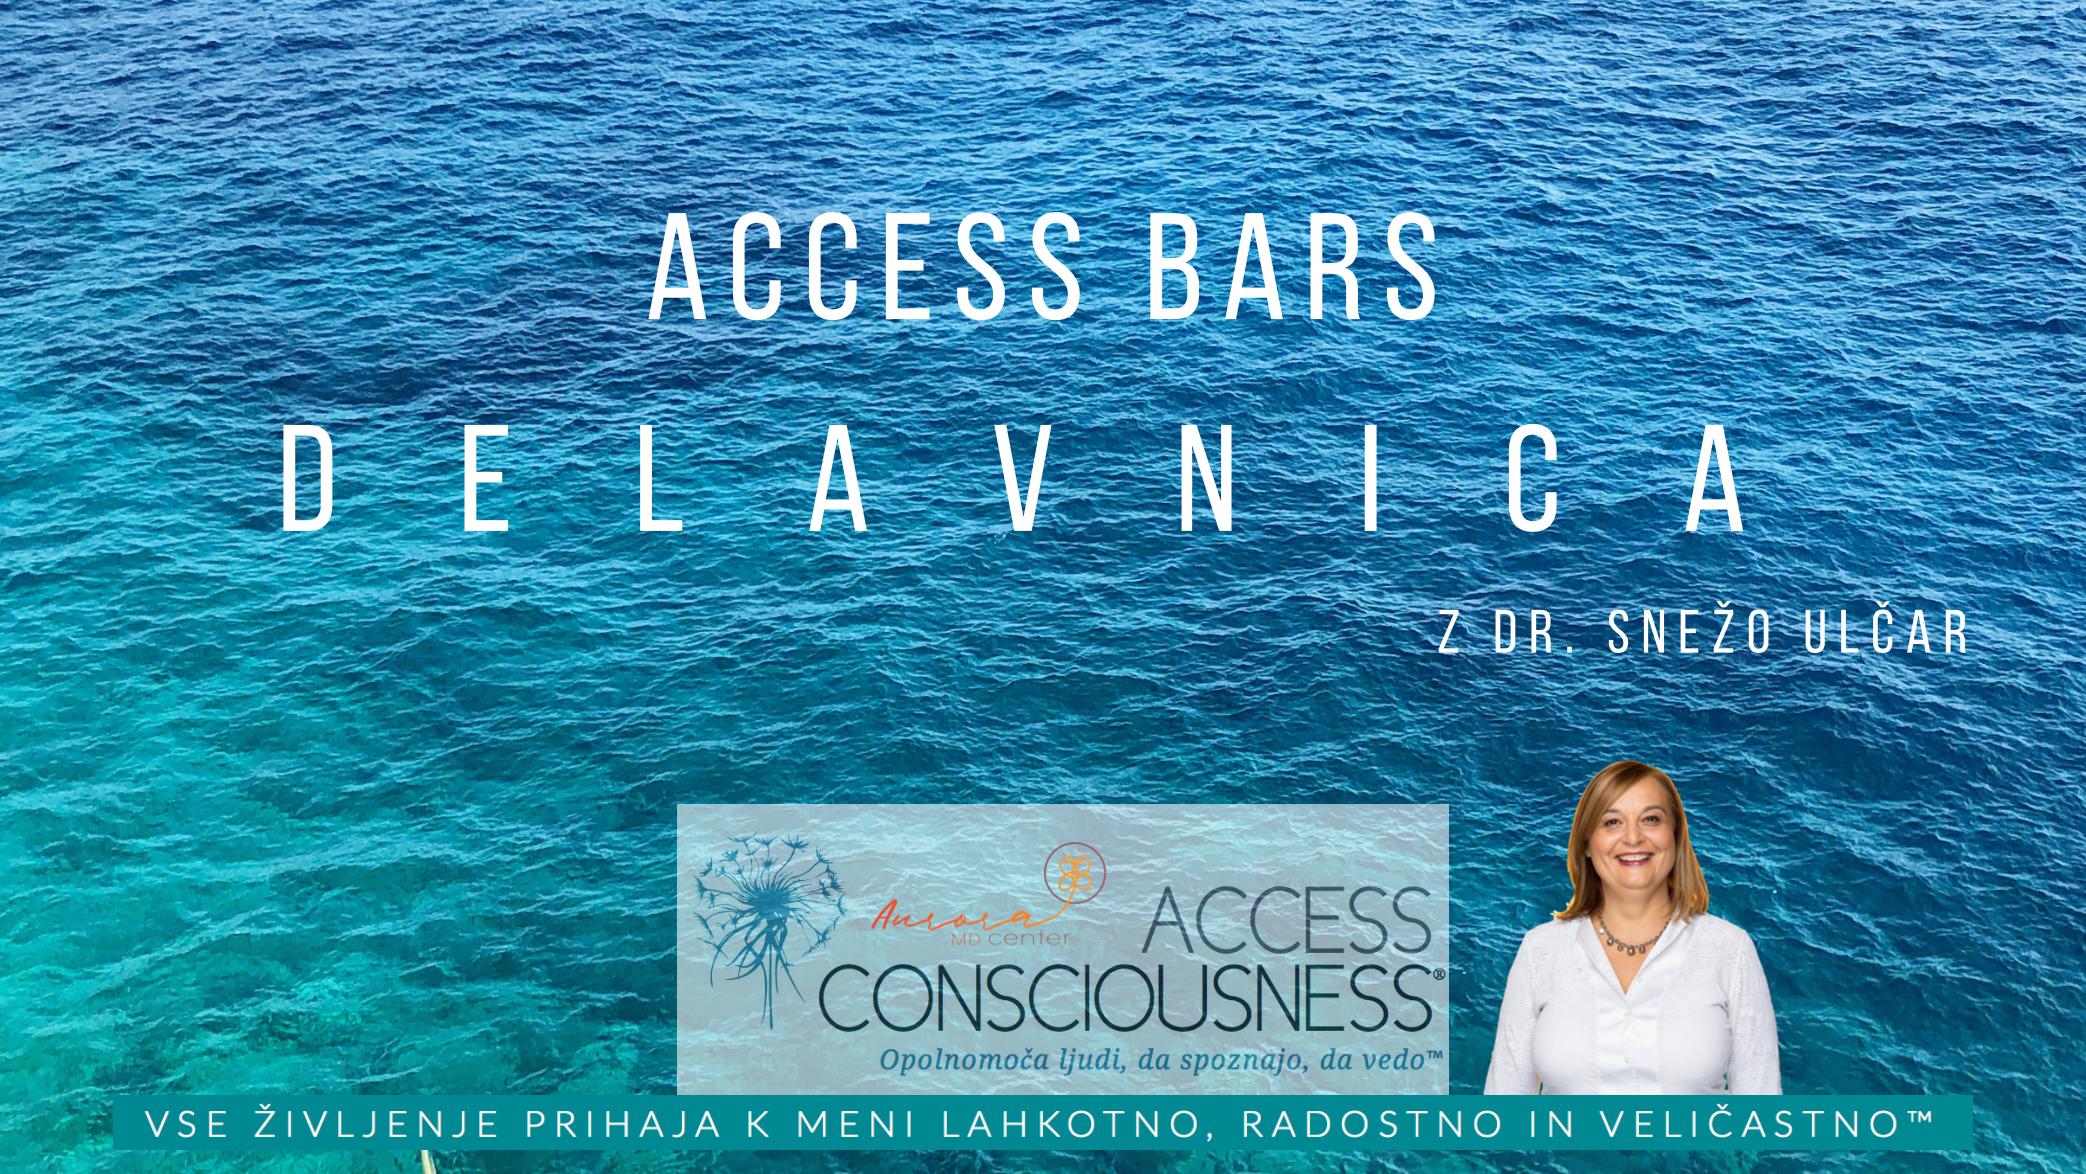 Access Bars delavnica s Snežo Ulčar, 9.7.2019, 9:30-17:30